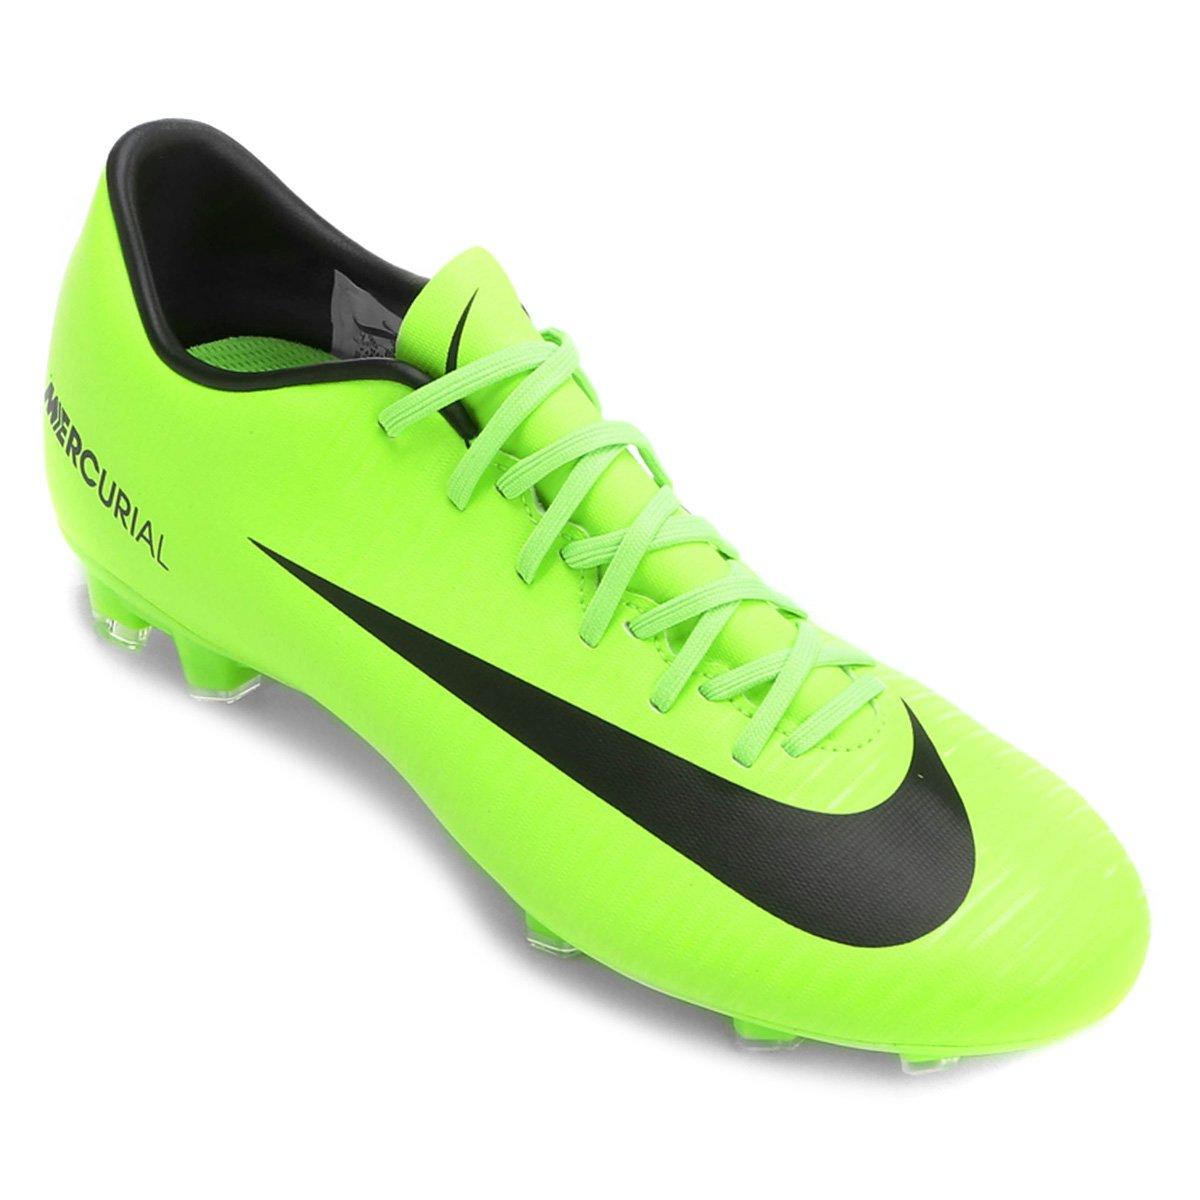 925fdcde094a0 Chuteira Campo Nike Mercurial Victory 6 FG - Compre Agora